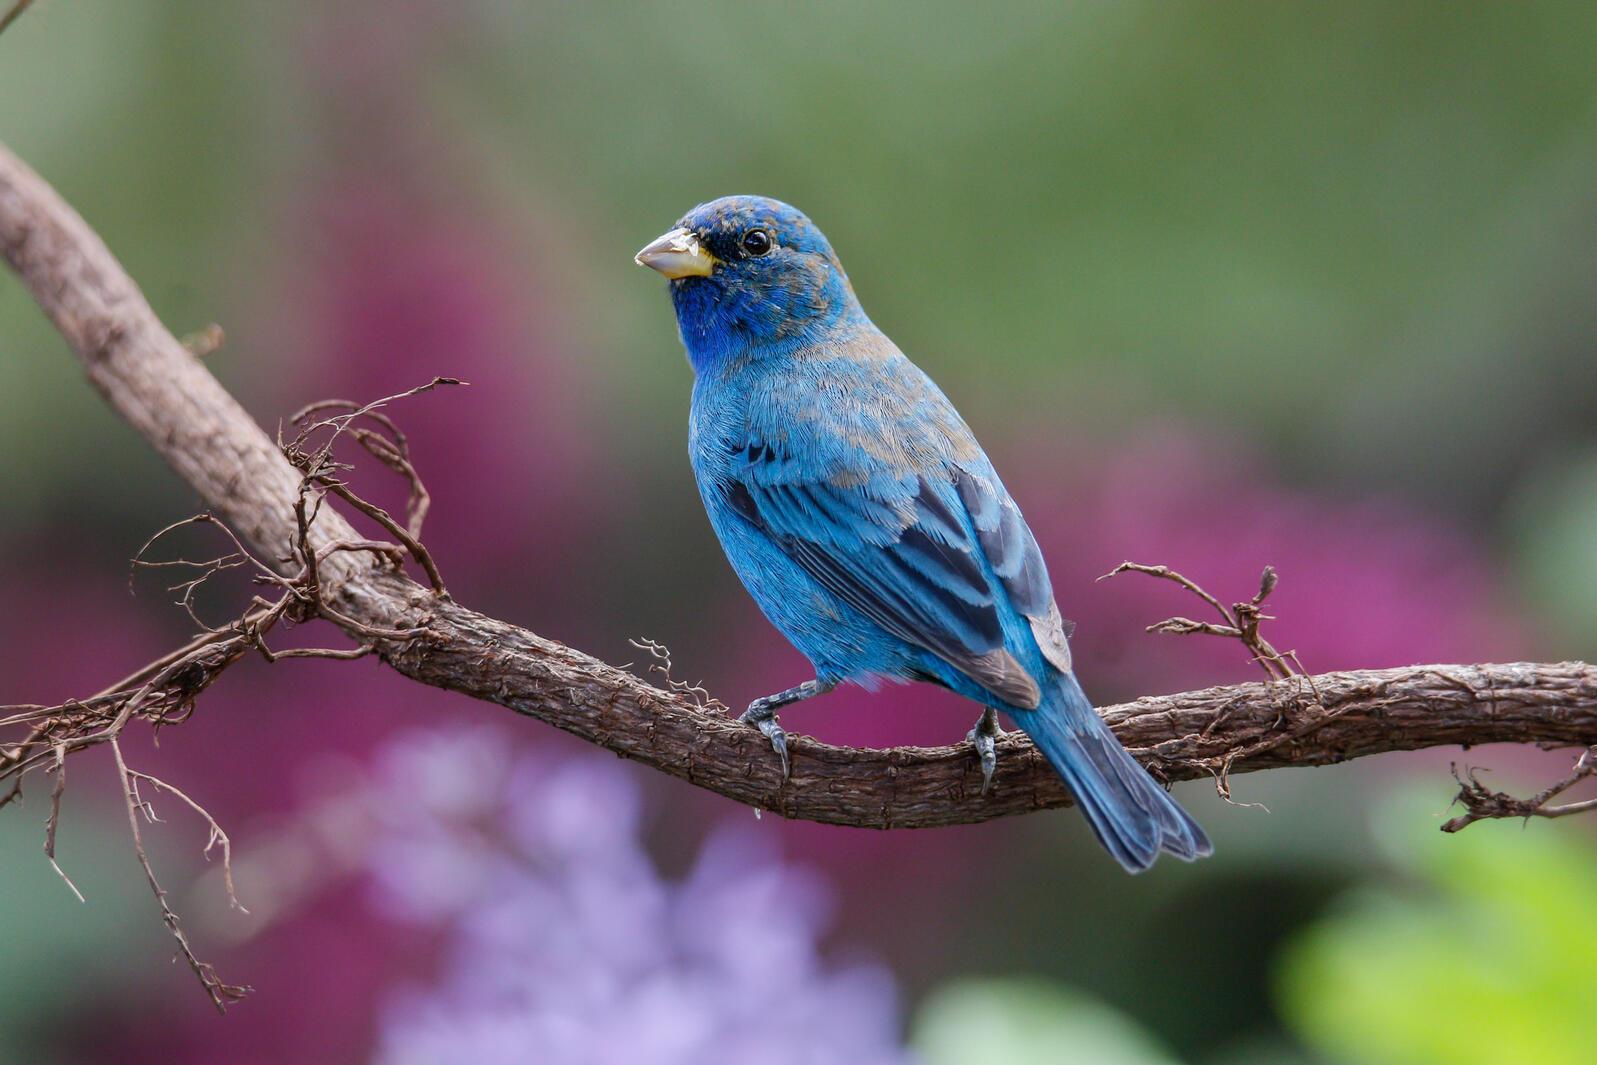 Indigo Bunting. Julie Torkomian/Audubon Photography Awards